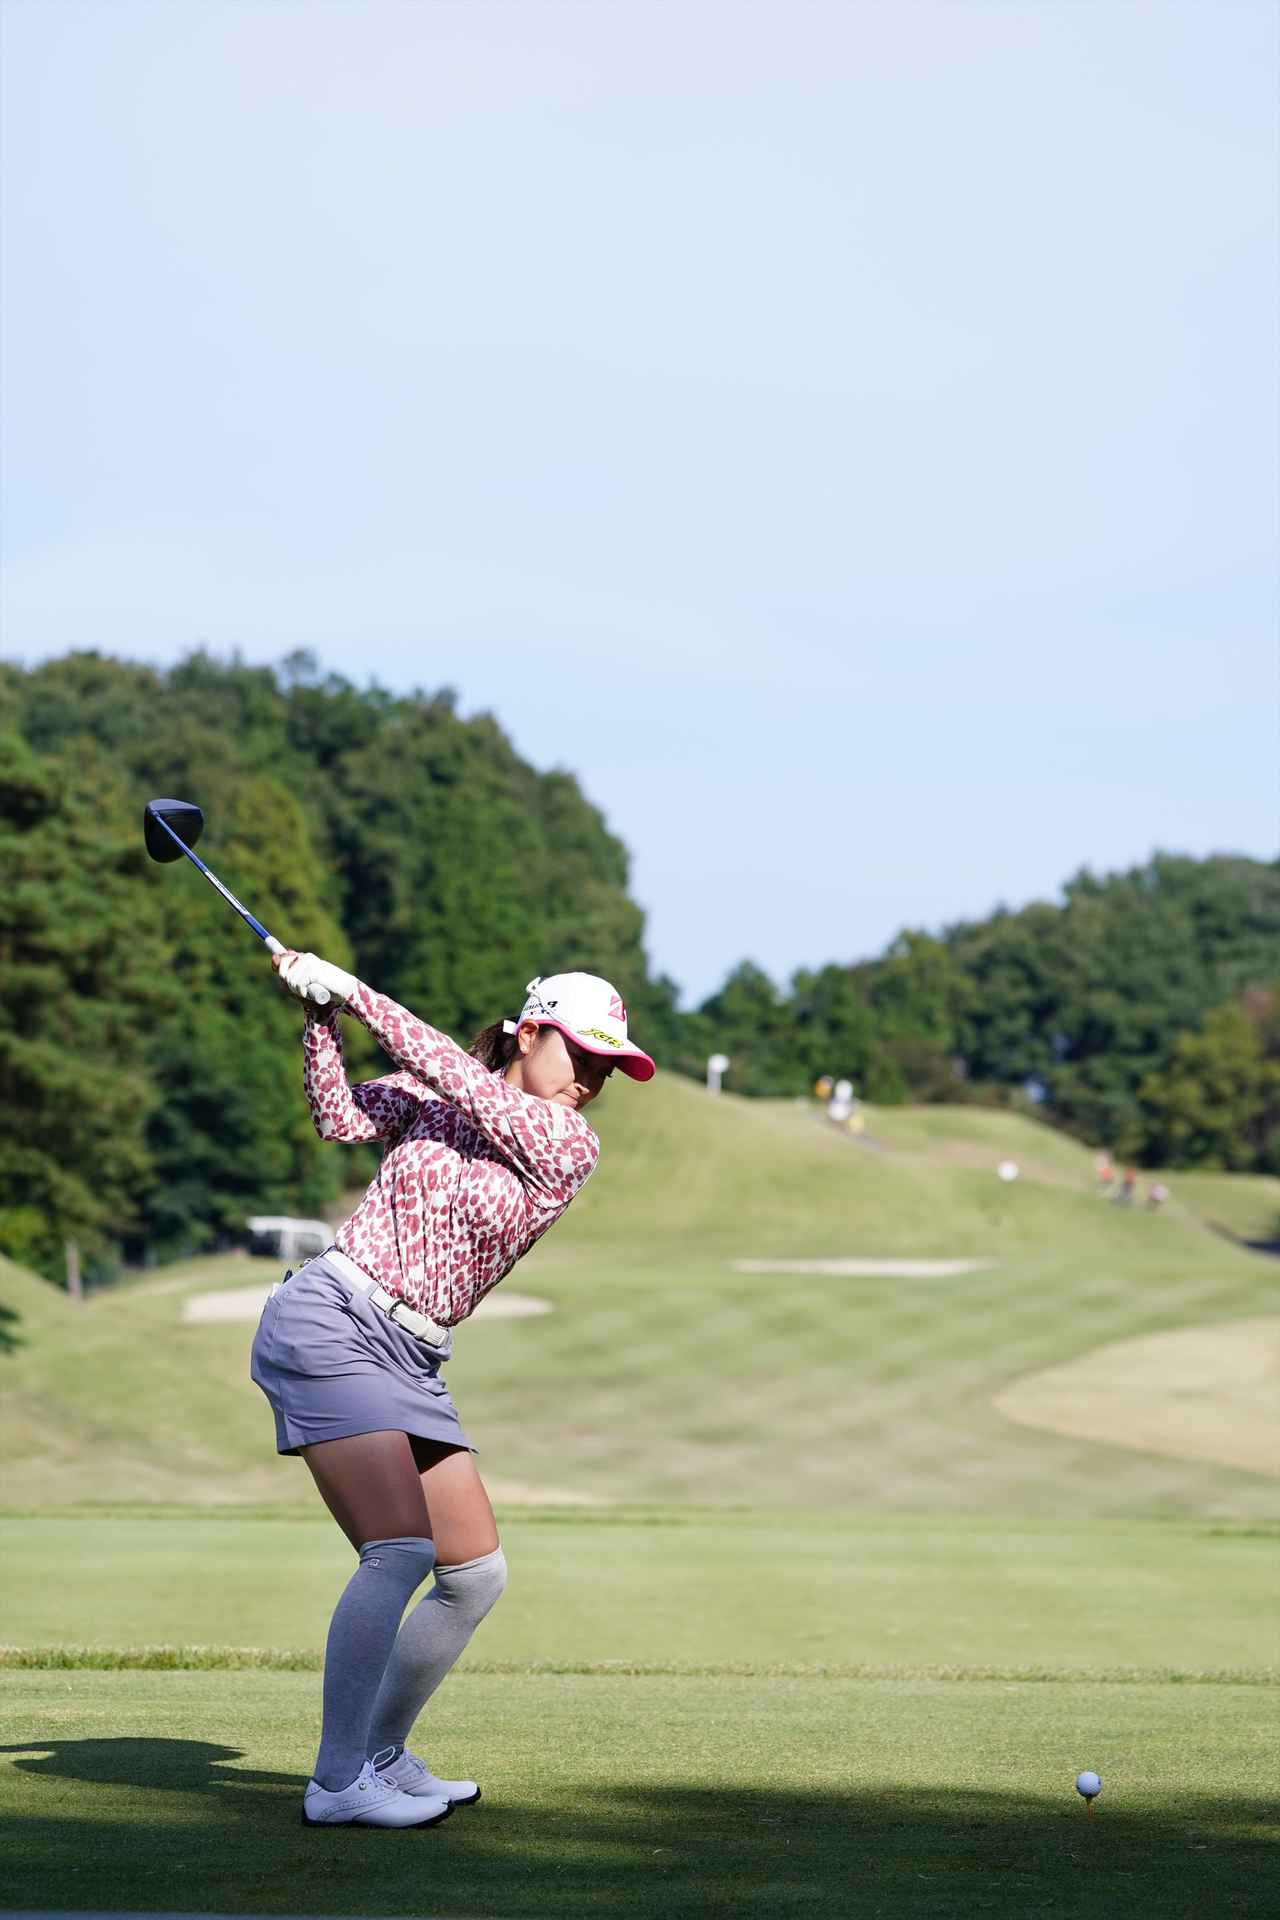 Images : 7番目の画像 - 高木優奈 ドライバー後方連続写真 - みんなのゴルフダイジェスト